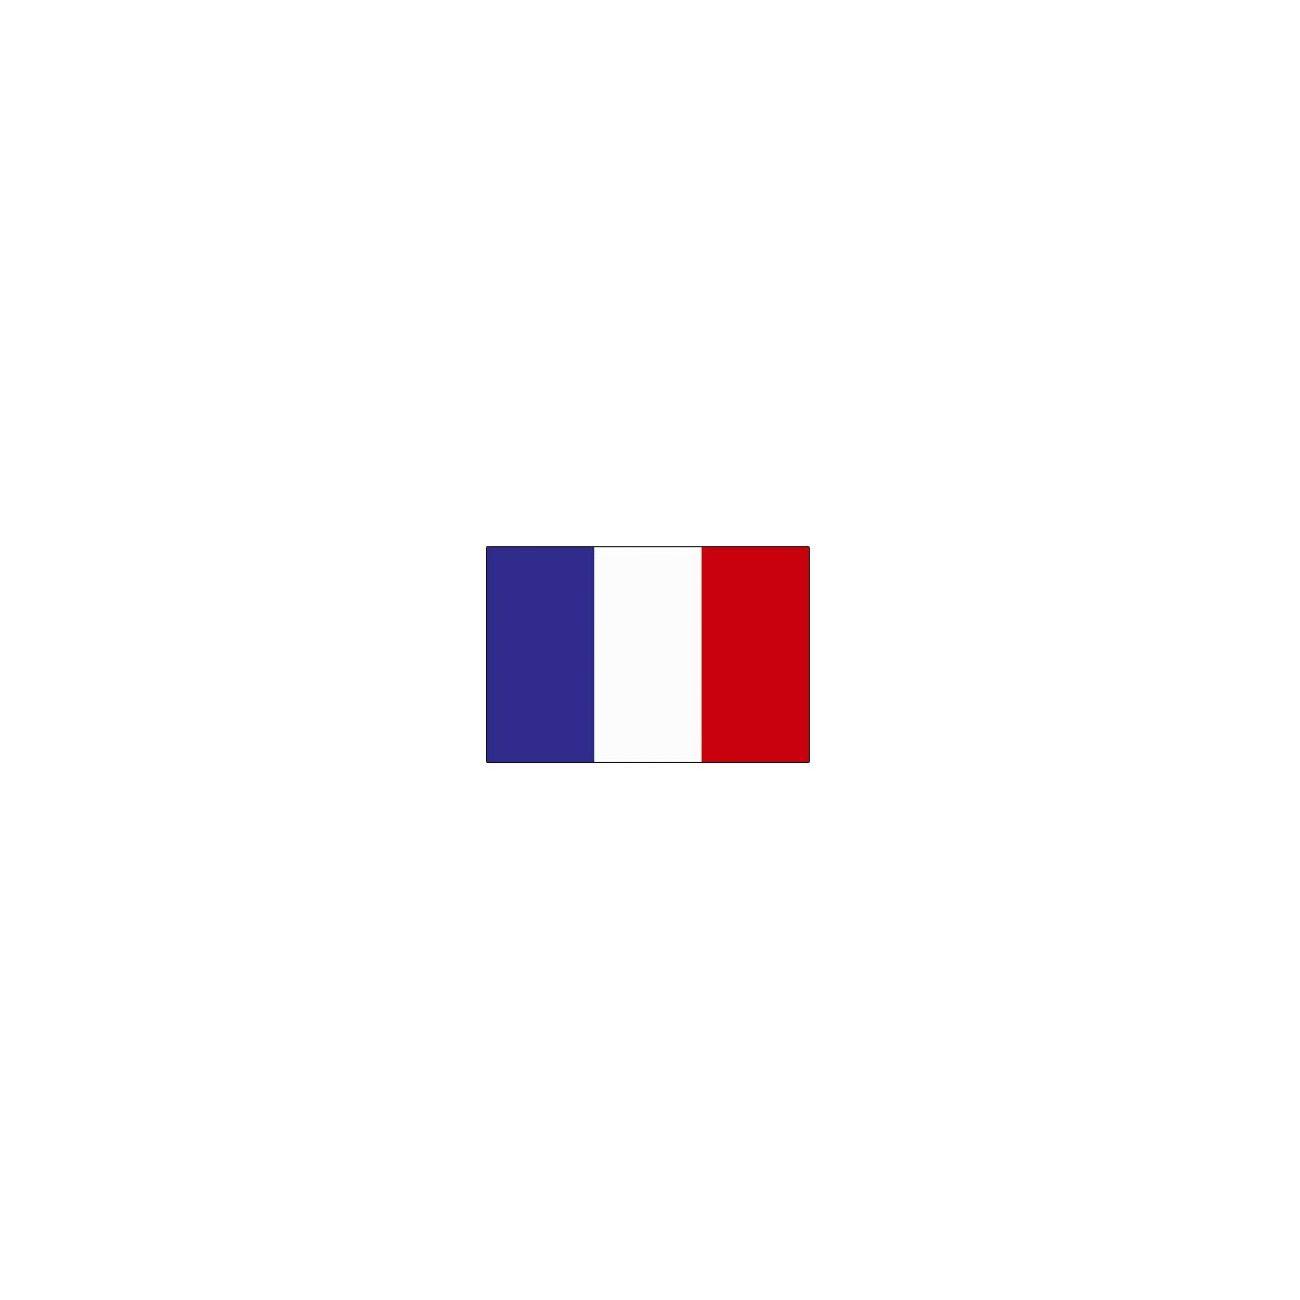 Flagge Frankreich G 252 Nstig Kotte Amp Zeller